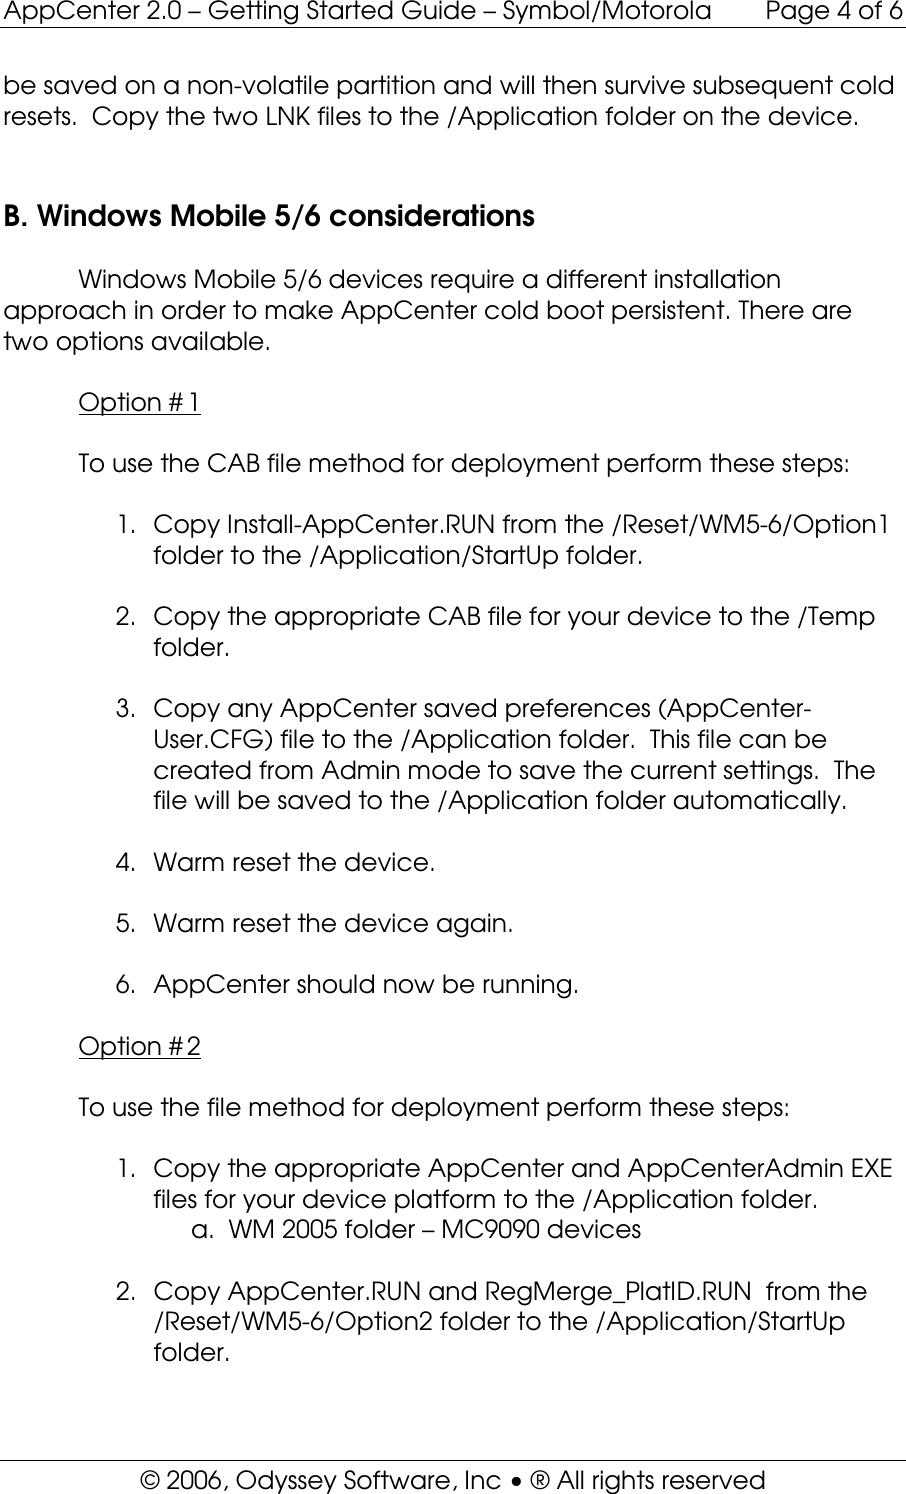 AppCenter 2 0 WM Getting Started Guide _Symbol Motorola_ App Center